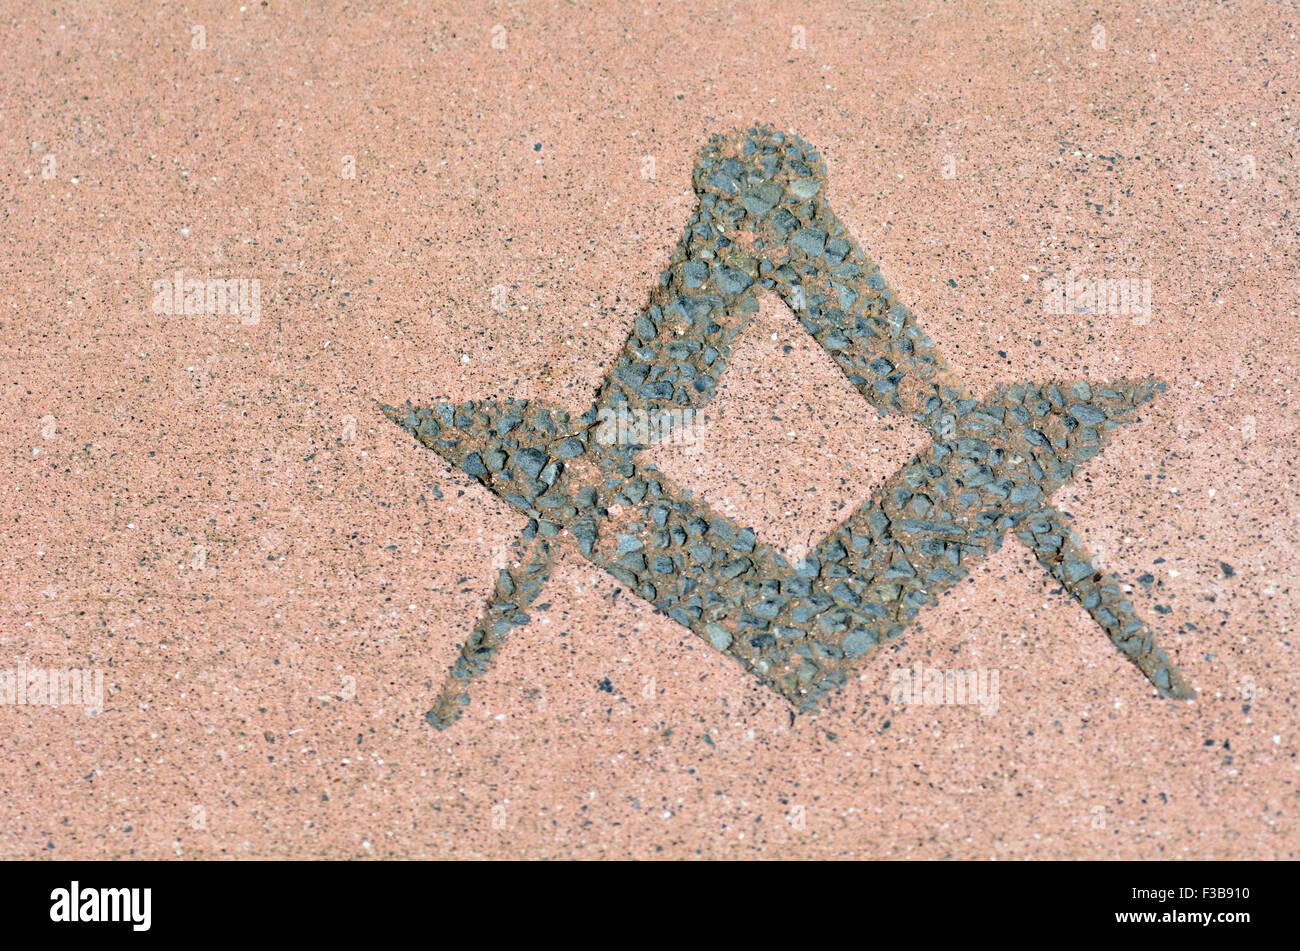 Freemasonry symbol made from stones on the ground. - Stock Image